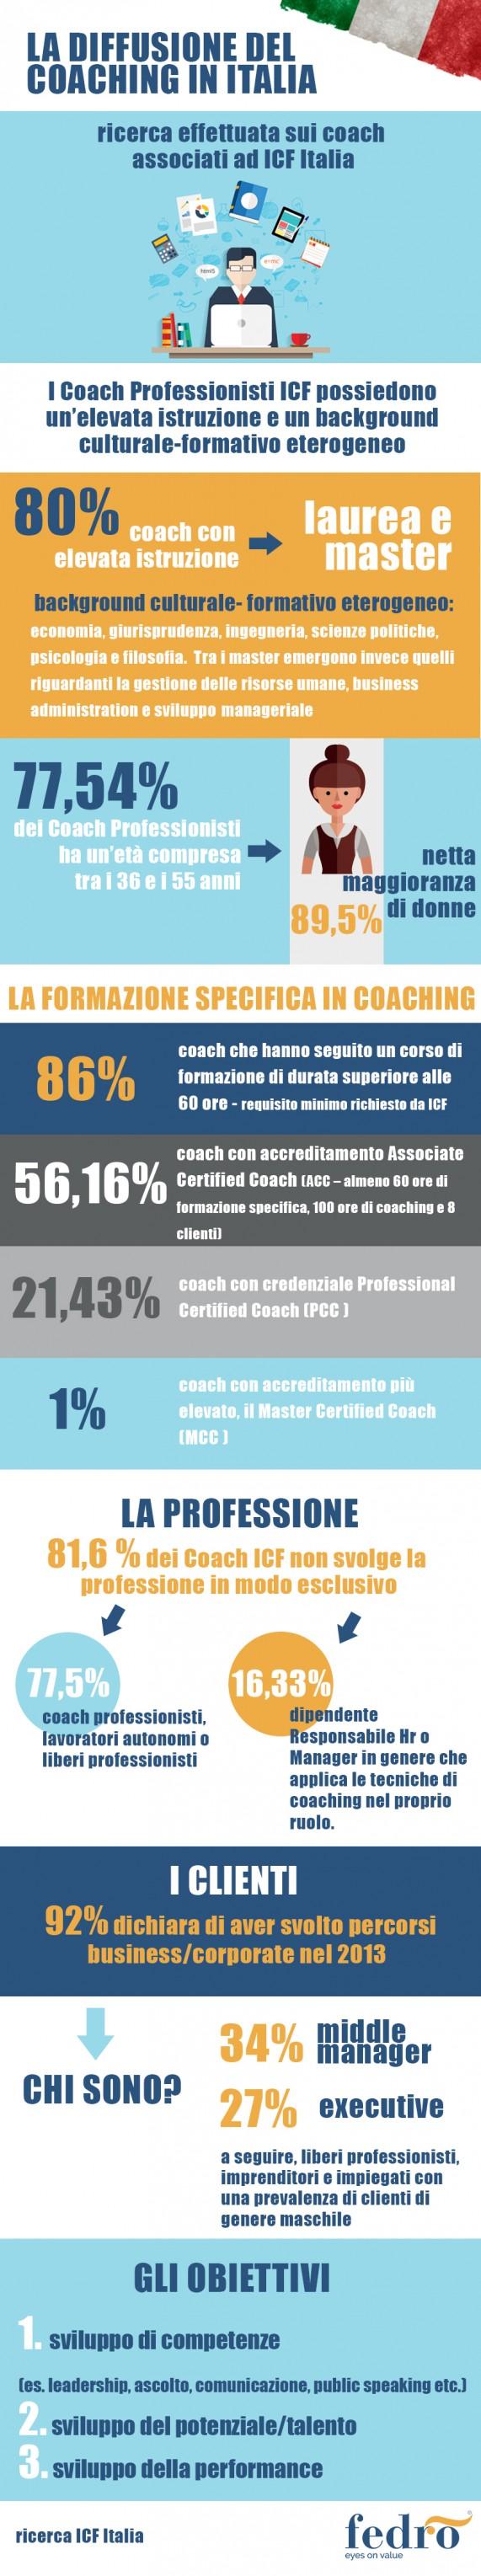 coaching-italia